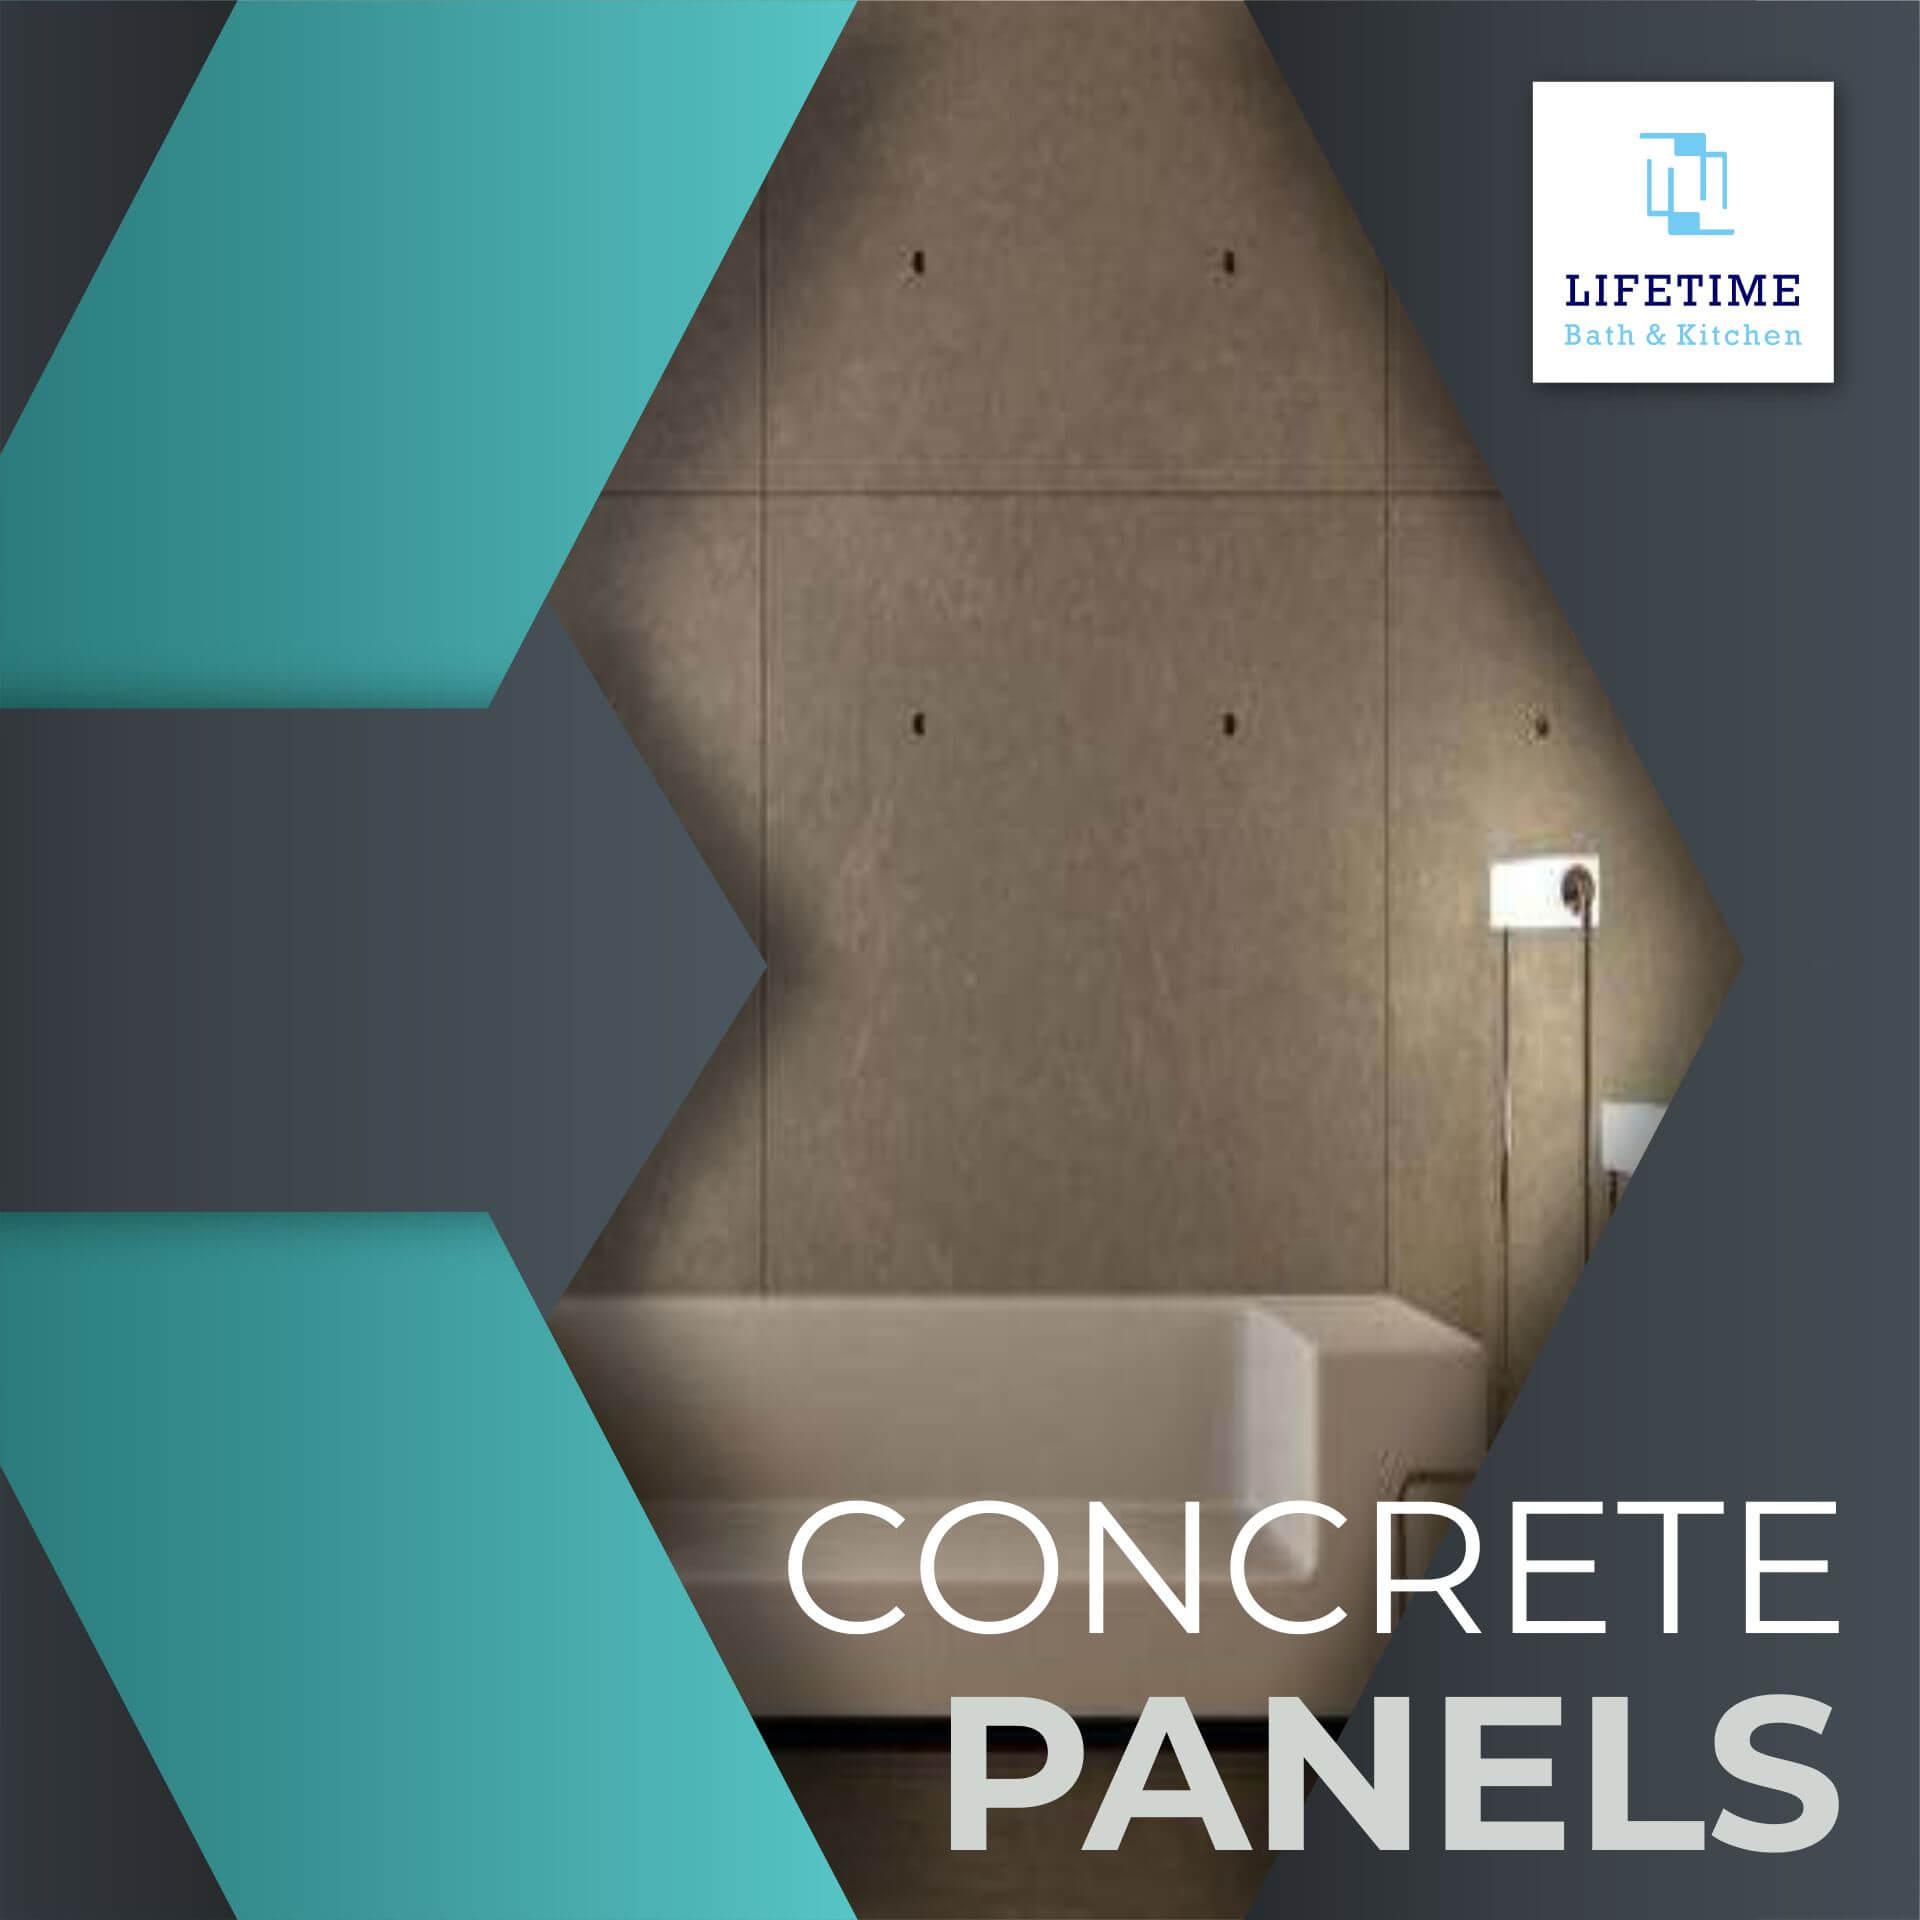 concrete-panel-page (1)